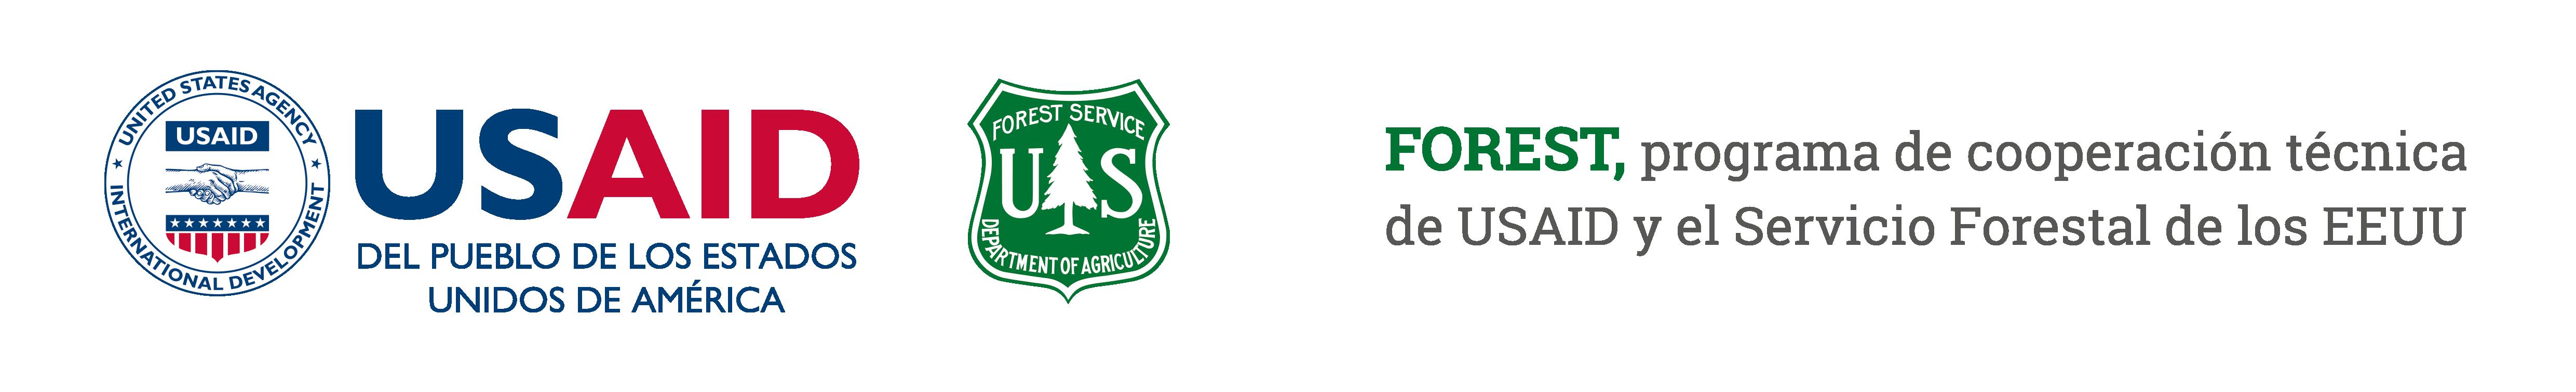 logo forest